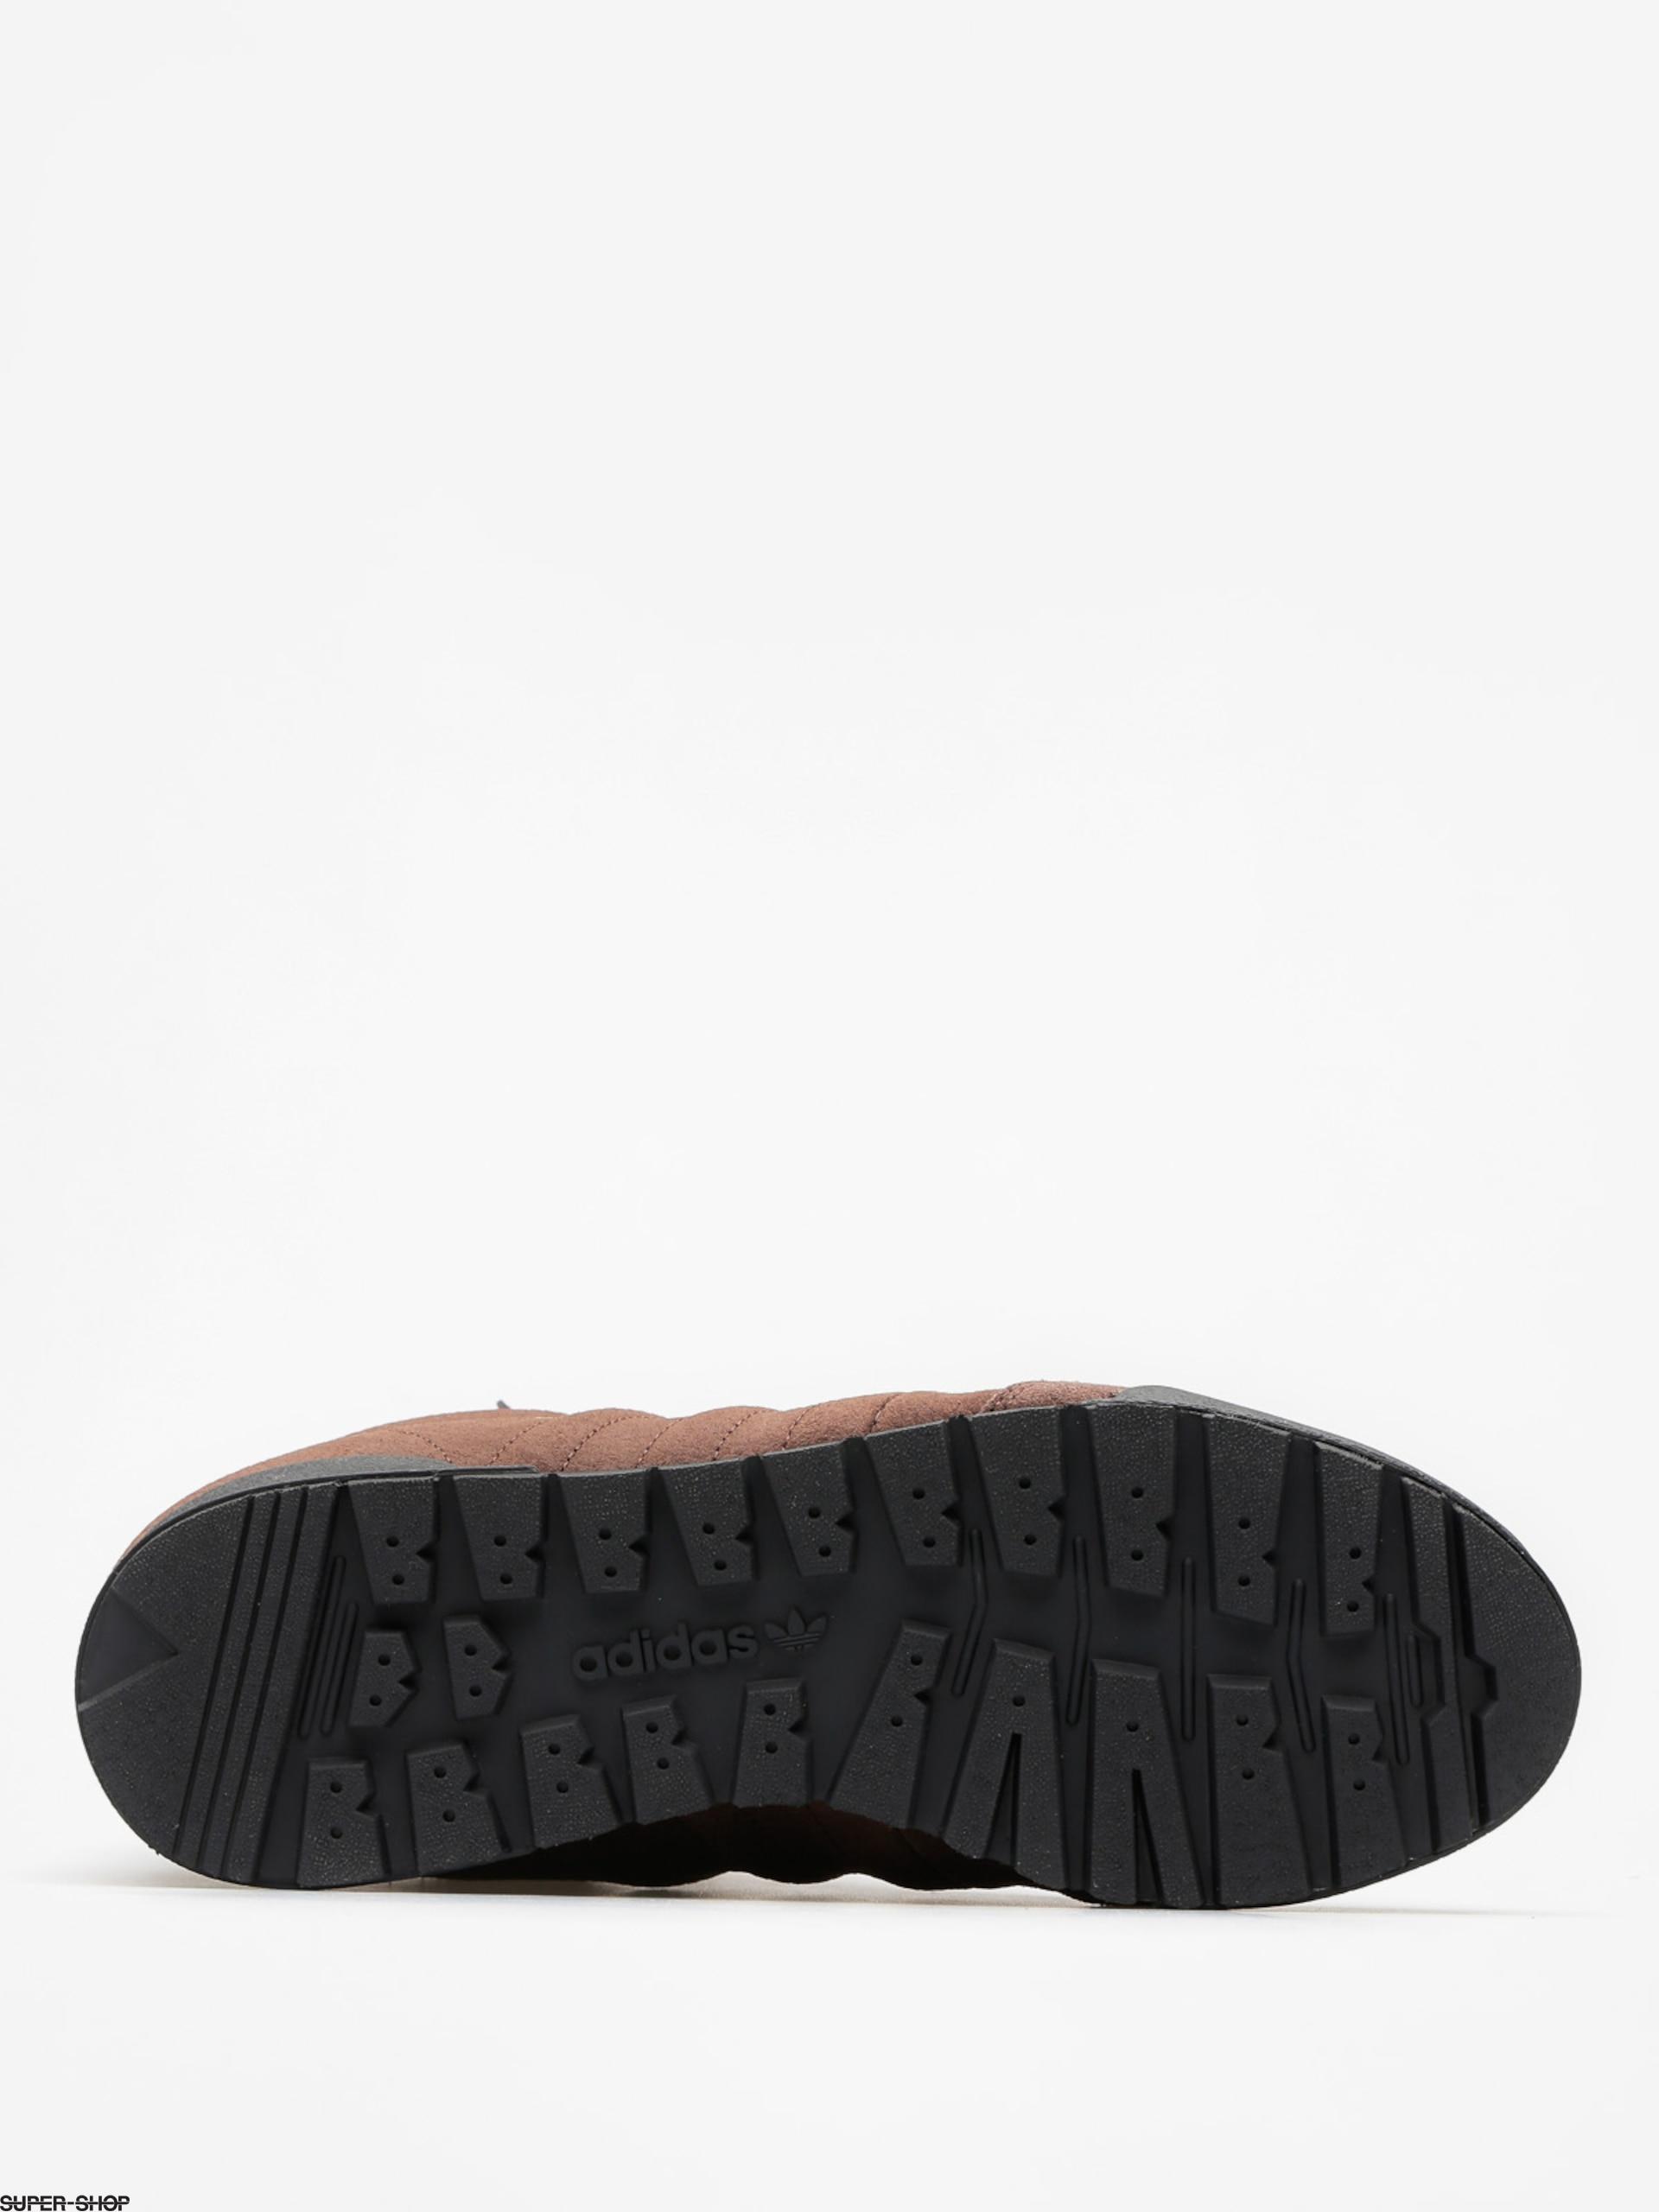 adidas Winter Chaussures Jake Boot Marron scarle cNoir